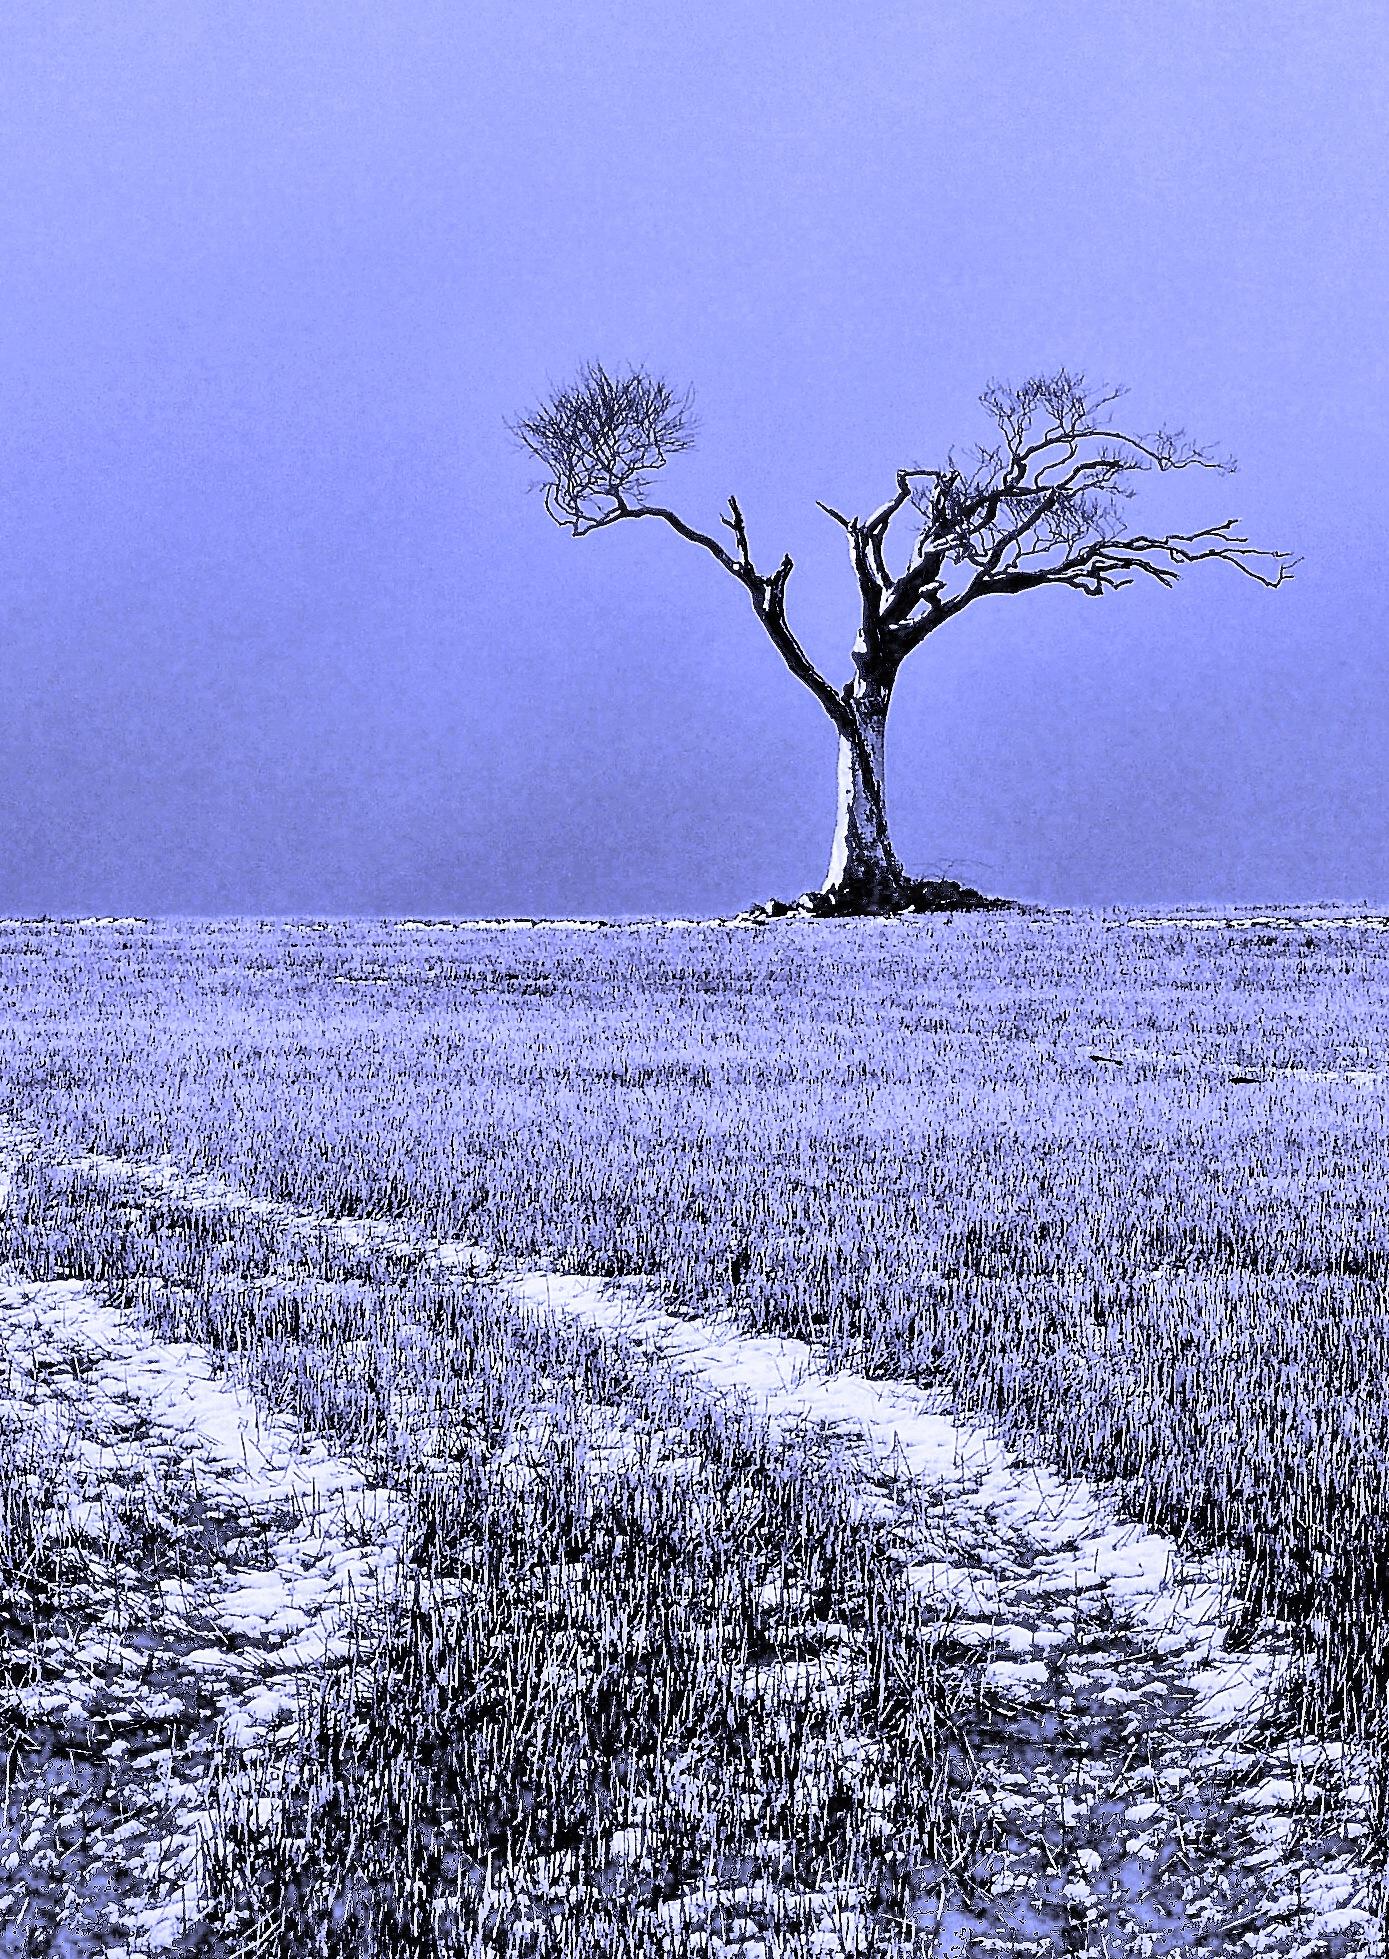 High Tree by PeterMChambers